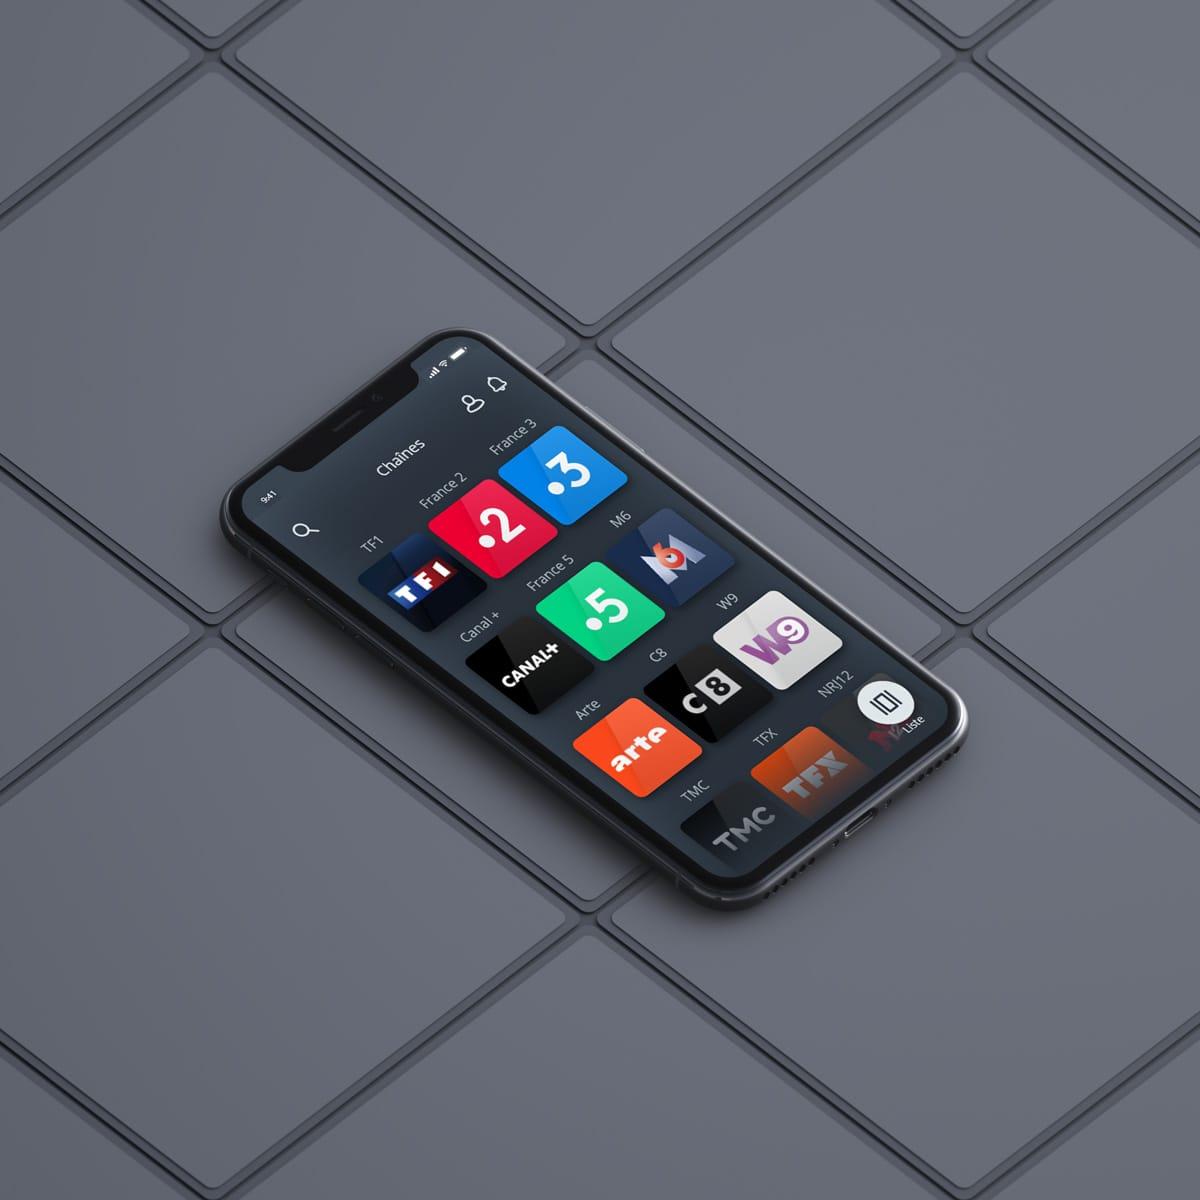 I want it app